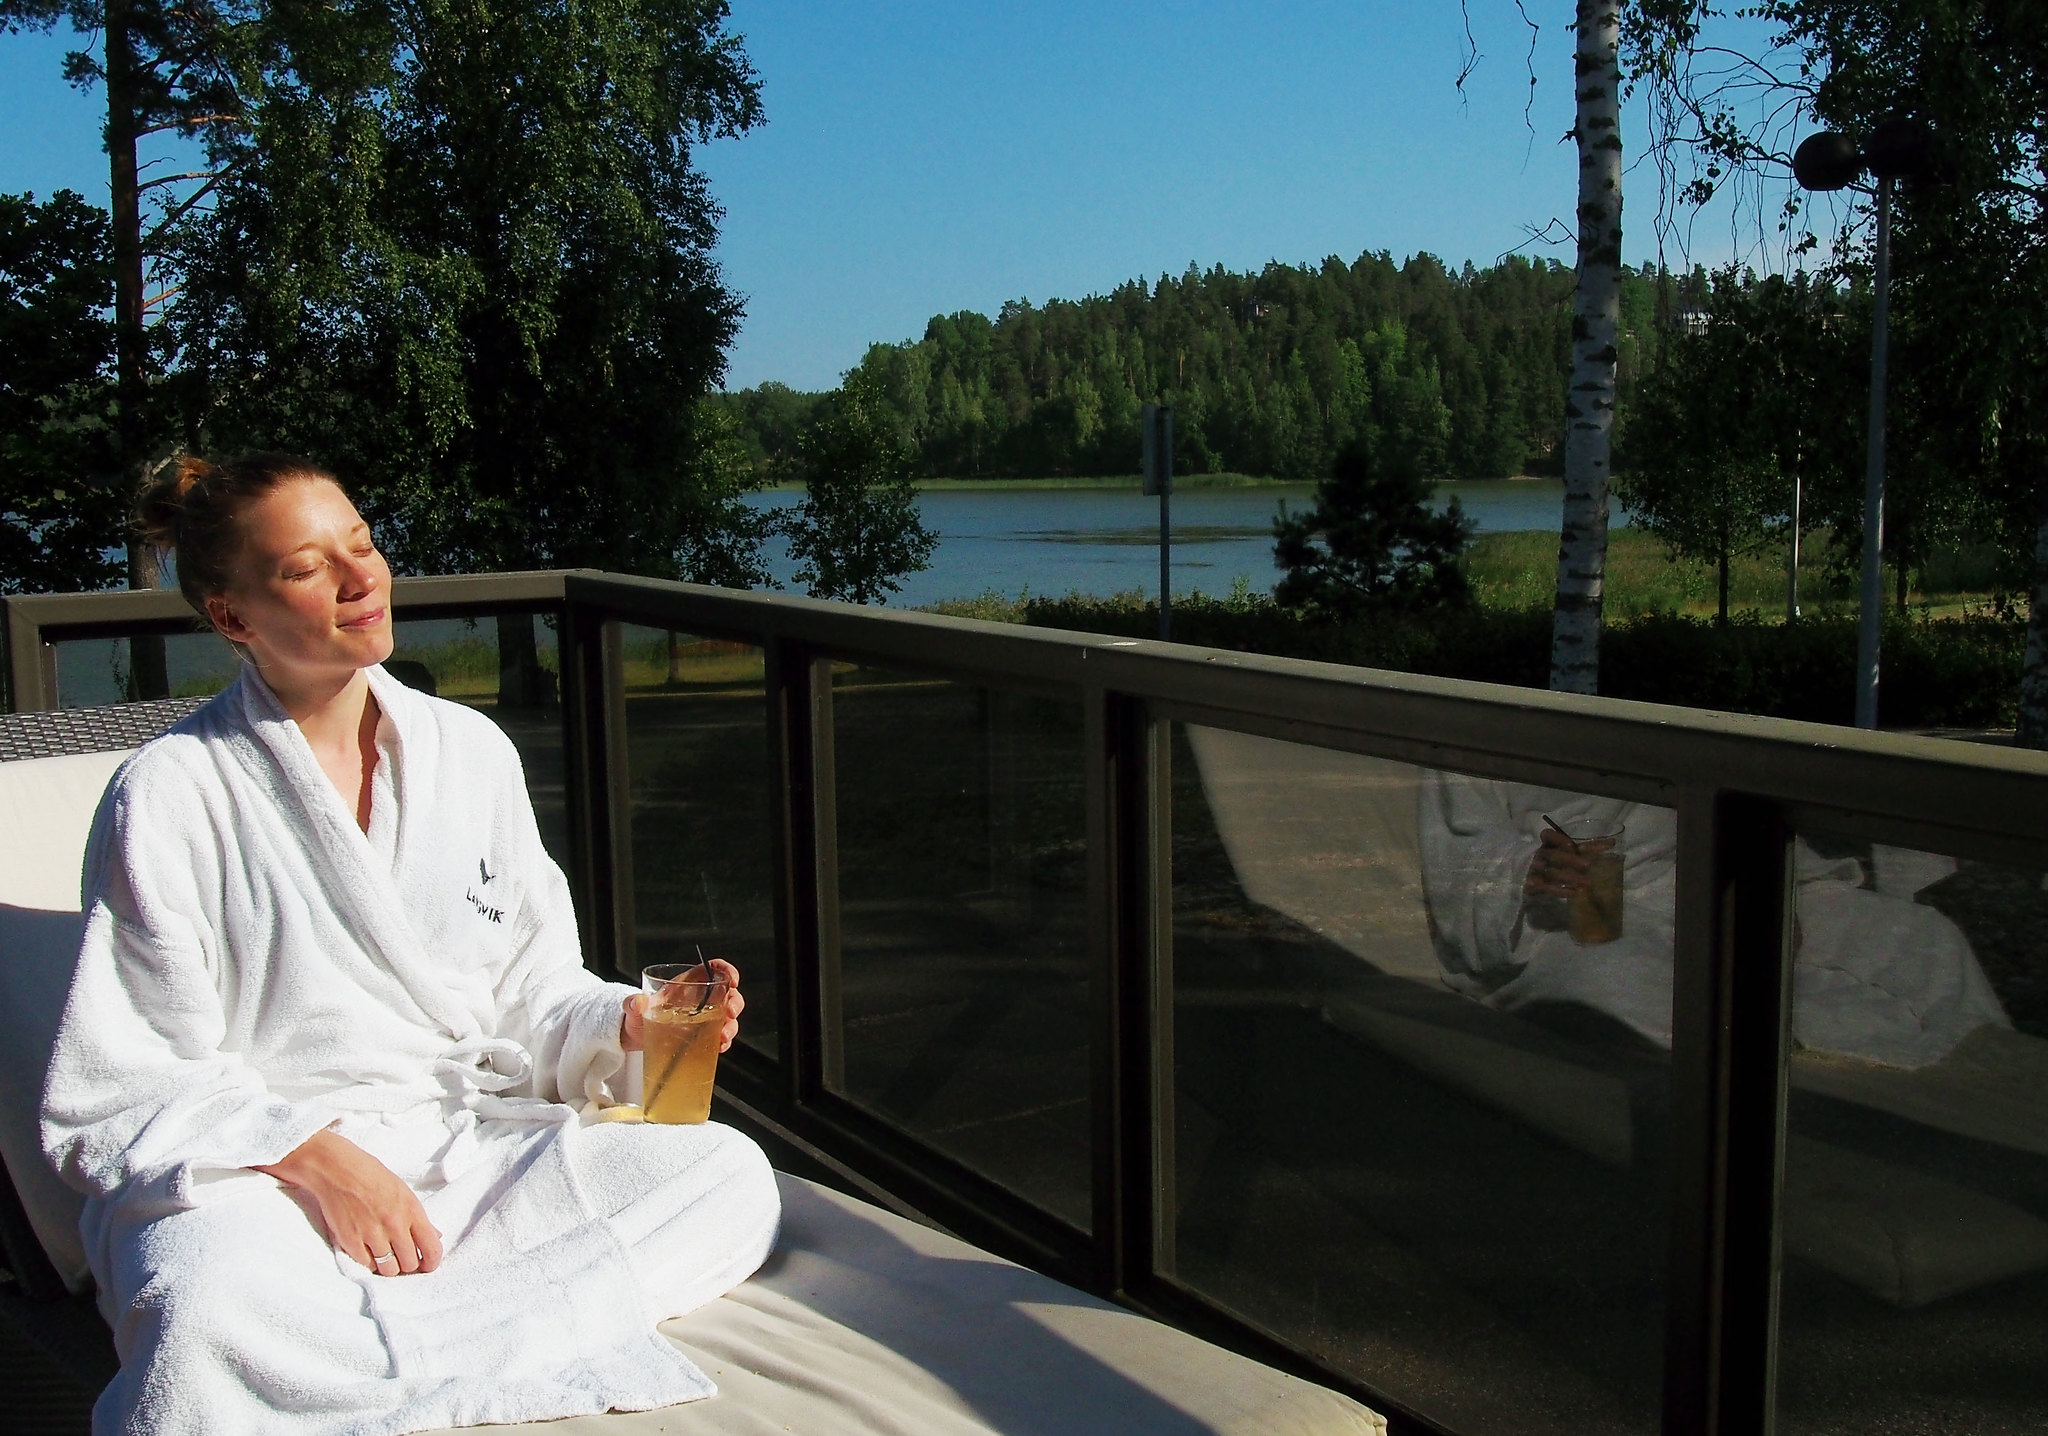 Långvik Kylpylähotelli